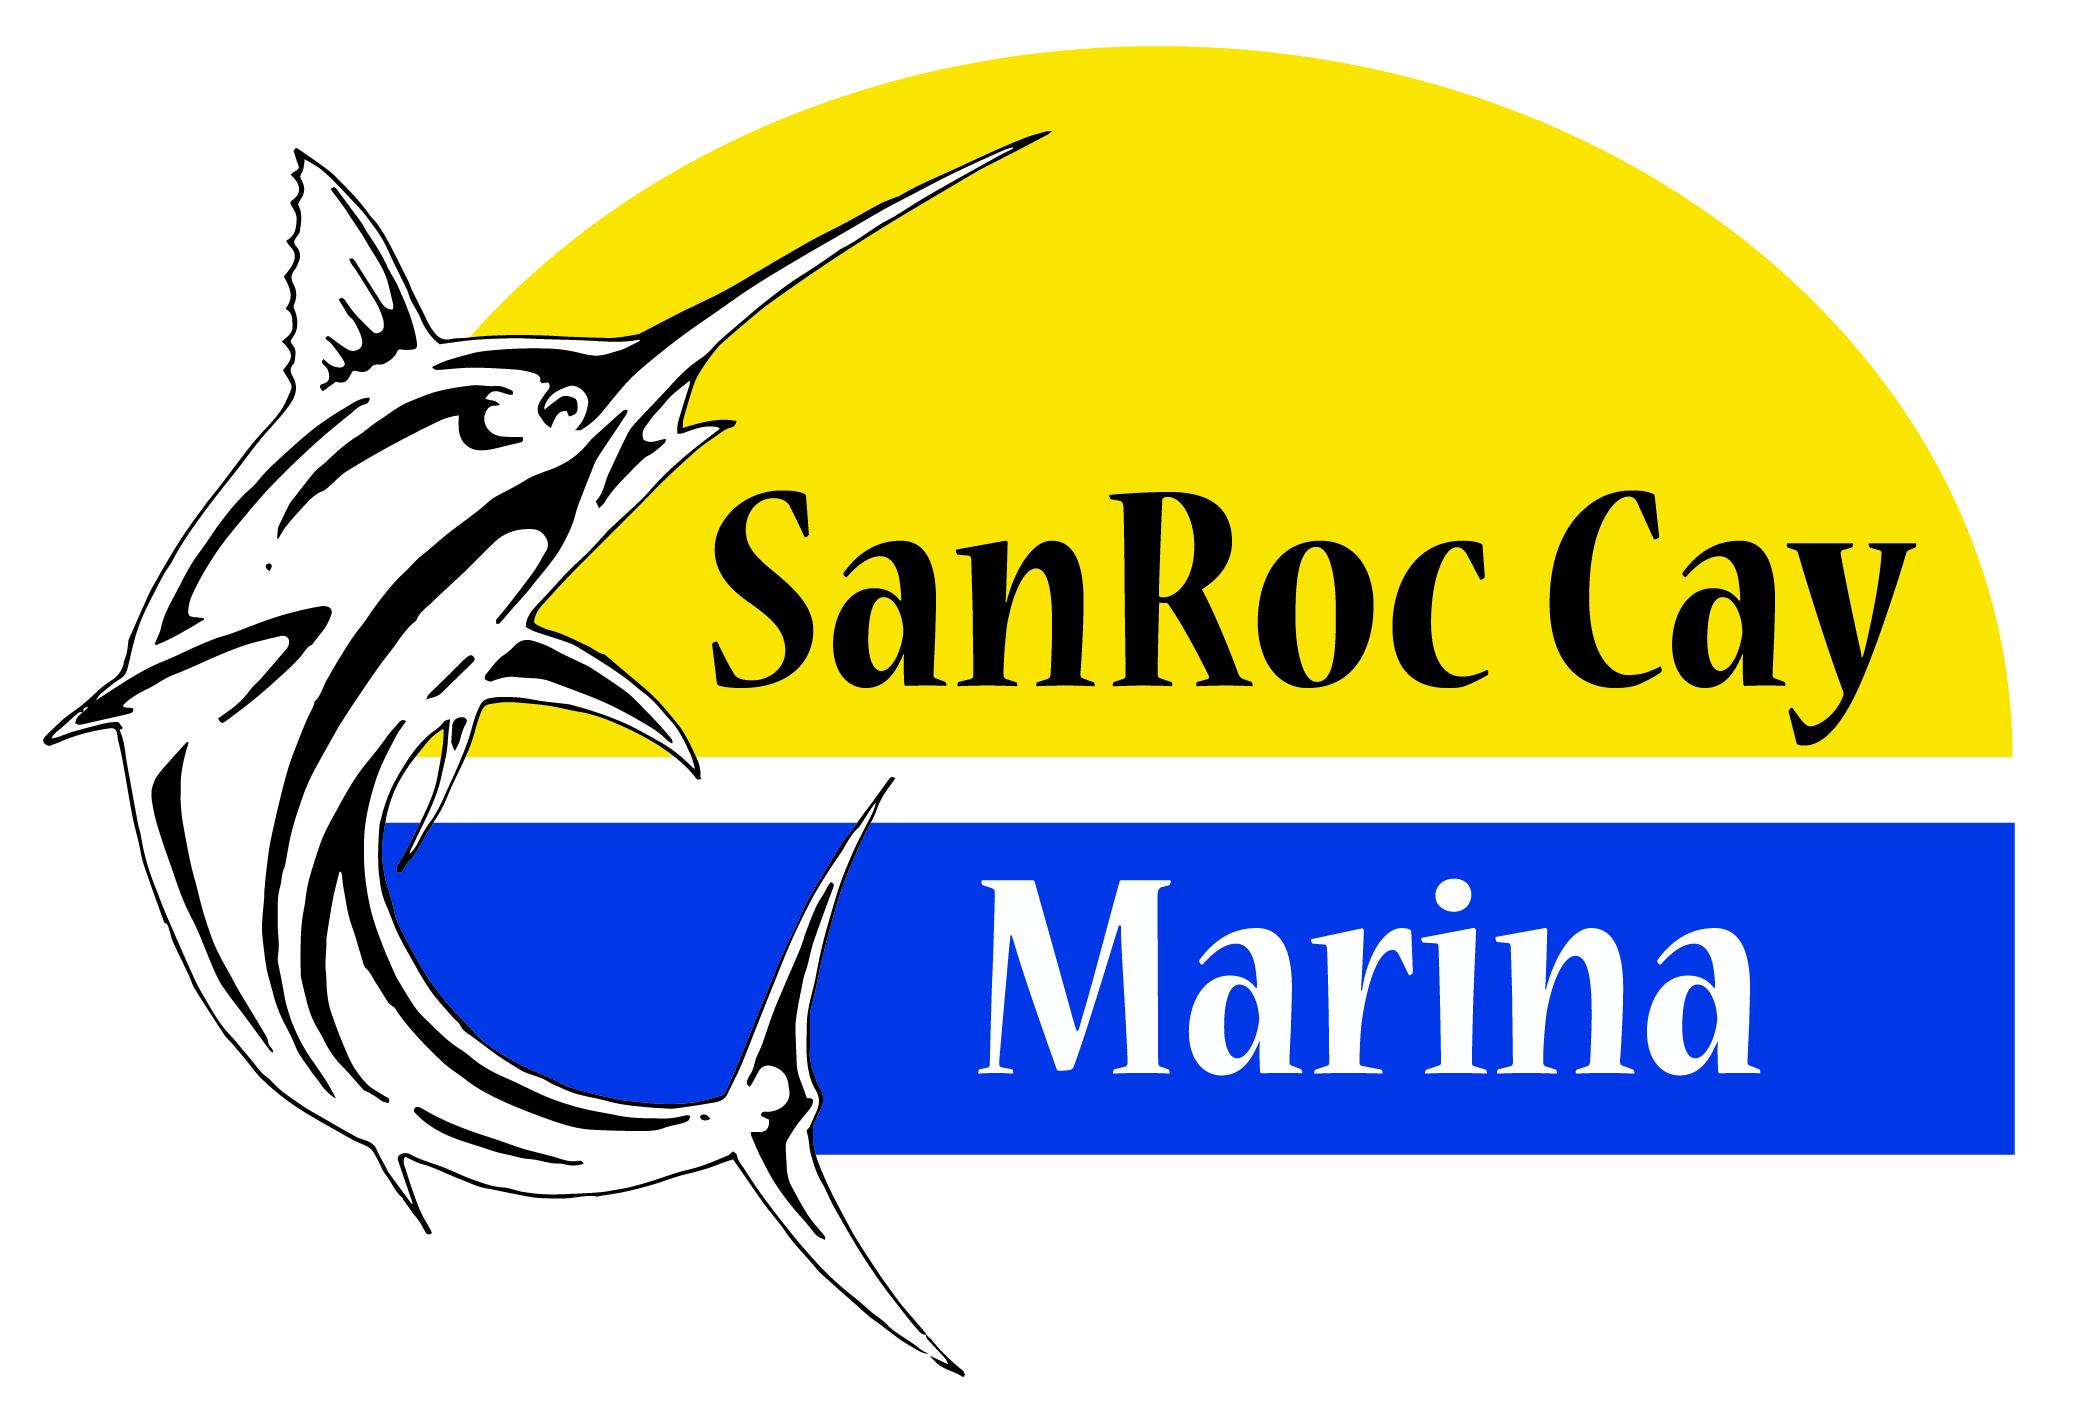 SanRoc Cay Marina